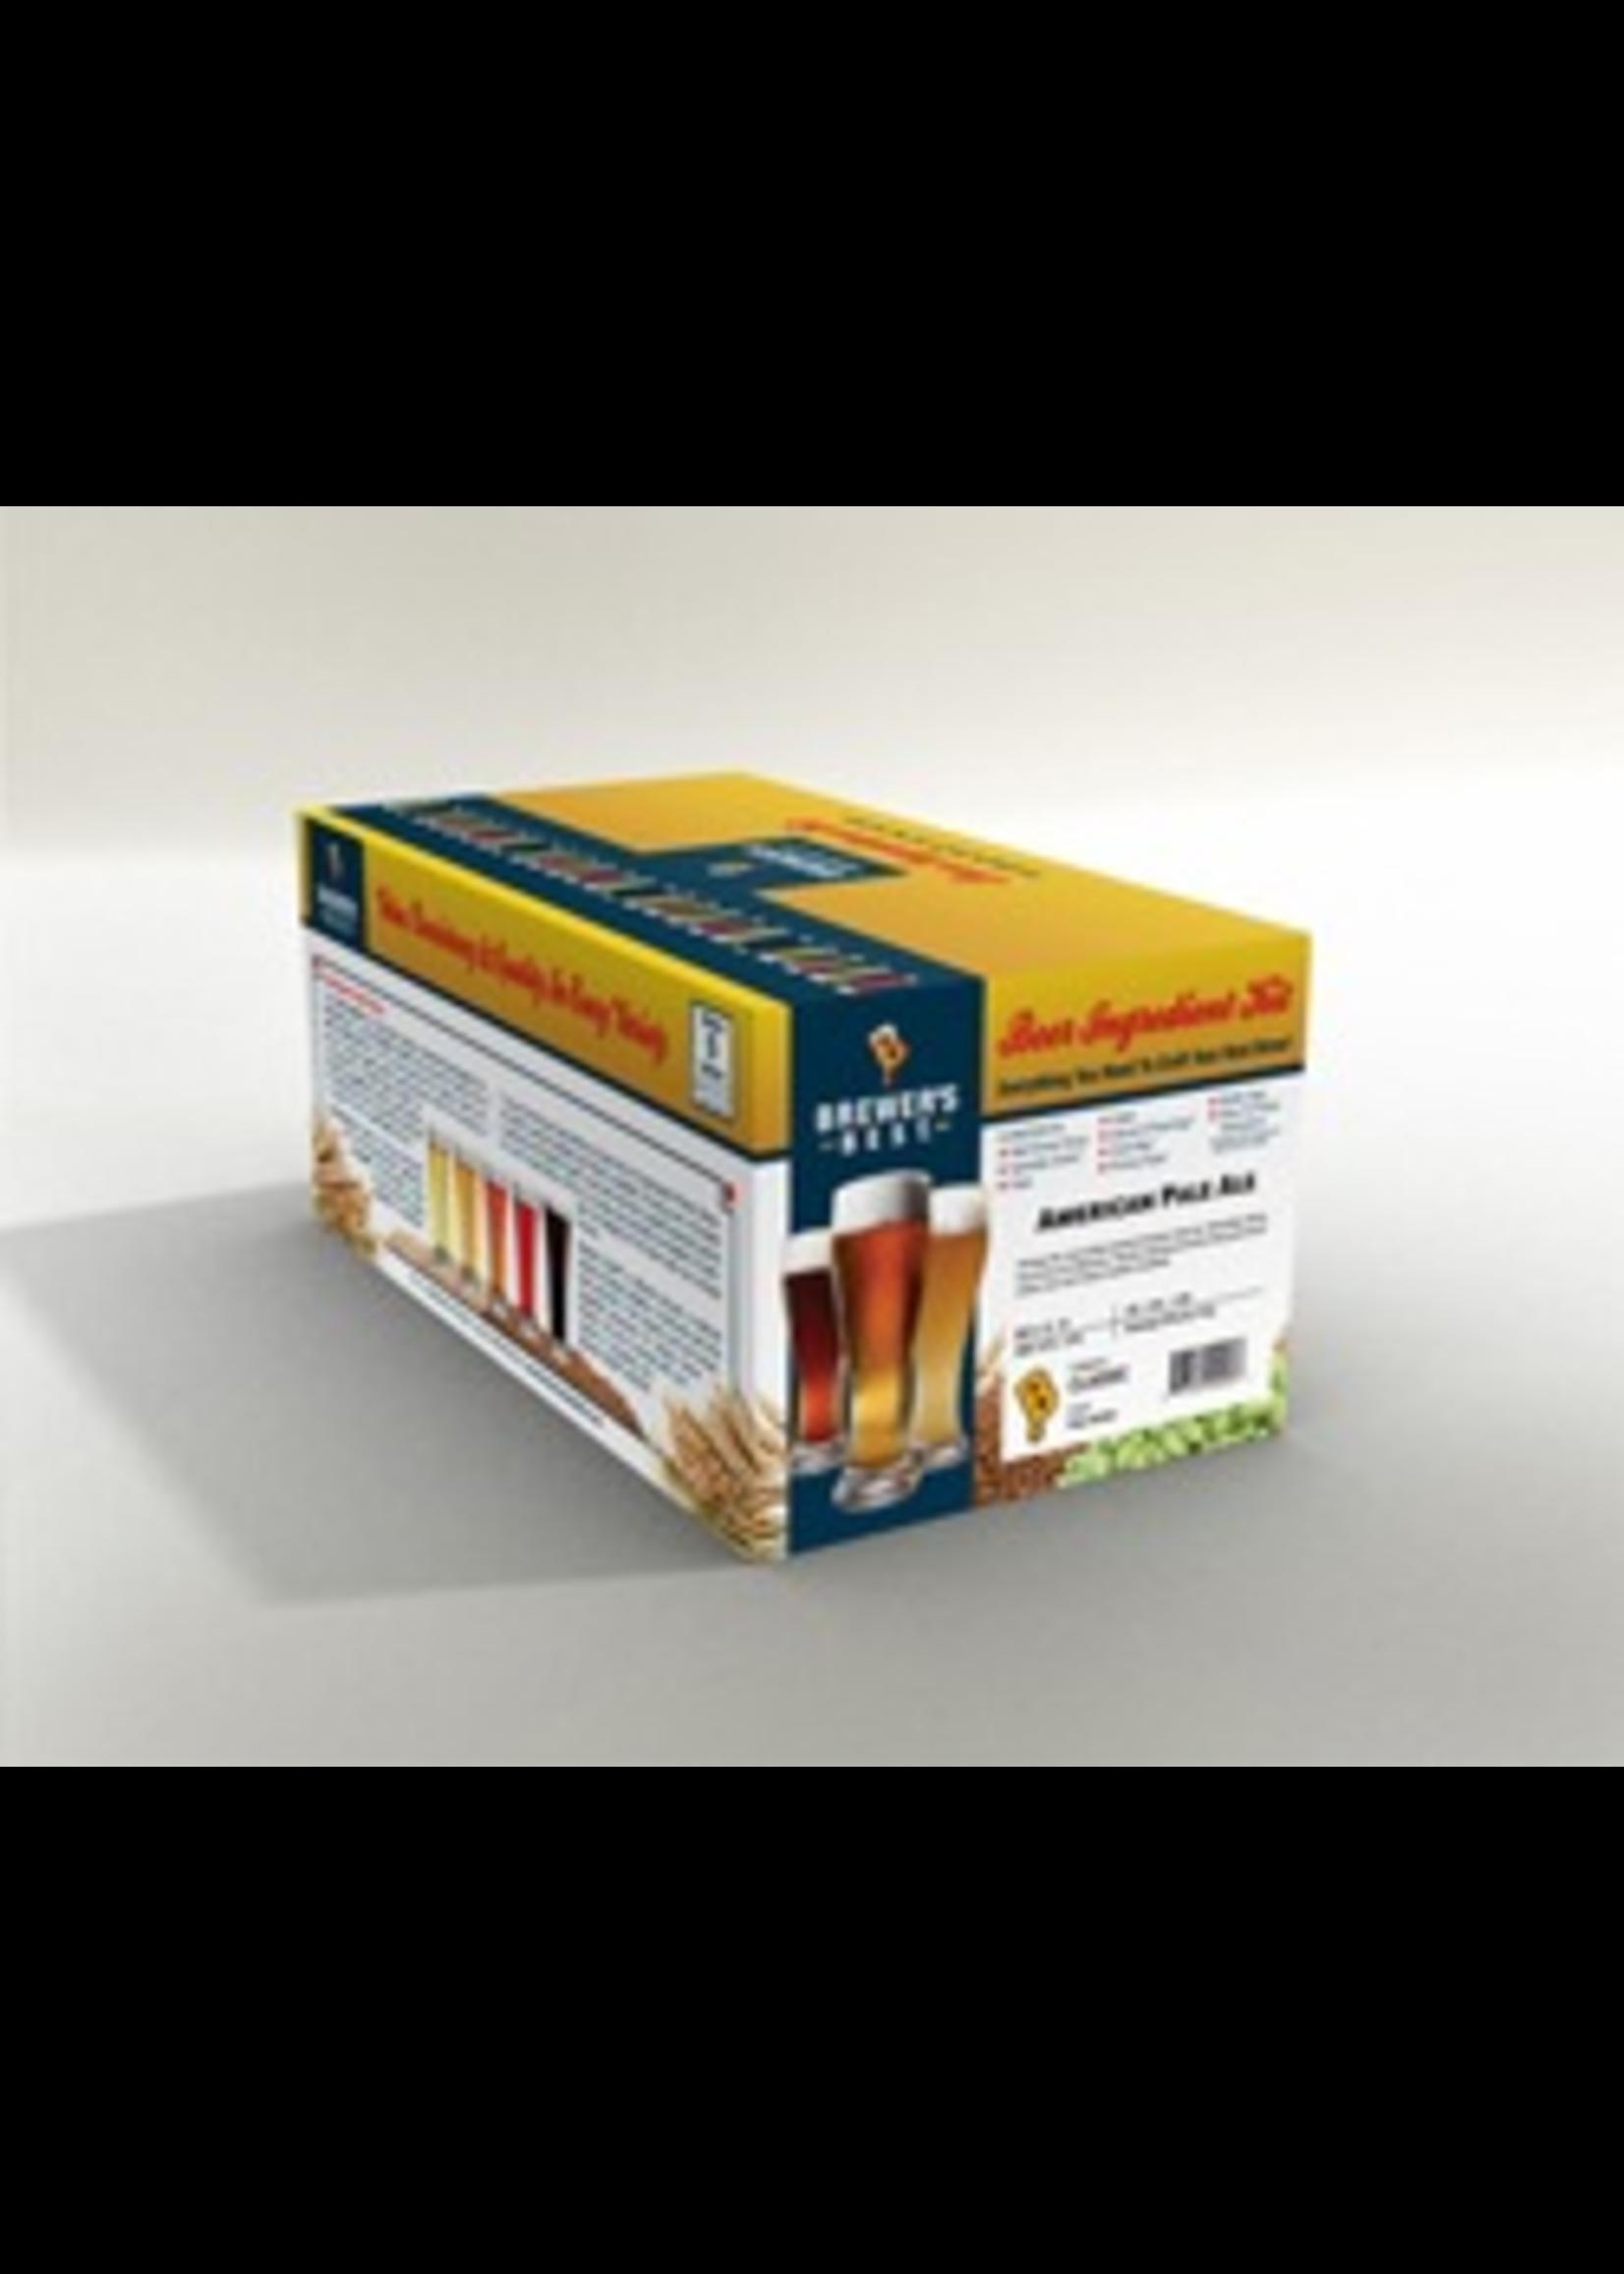 Ingredient Kits Brewer's Best Imperial Pale Ale - 5 Gallon Ingredient Kit